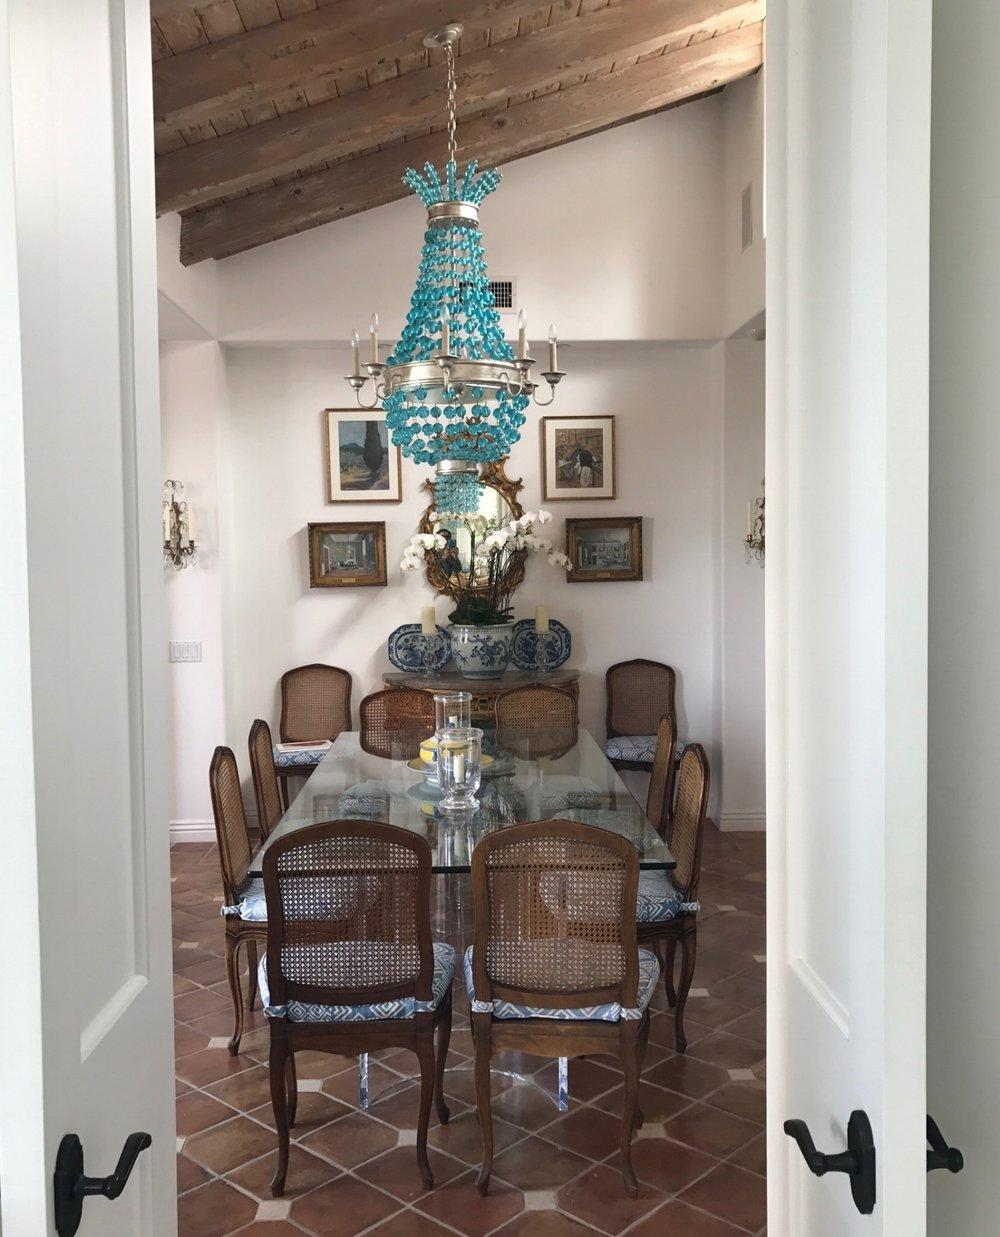 Laguna Beach Dining Room U0026nbsp;of Home Designer Ginny Magher, Tiled Floors,  Wood